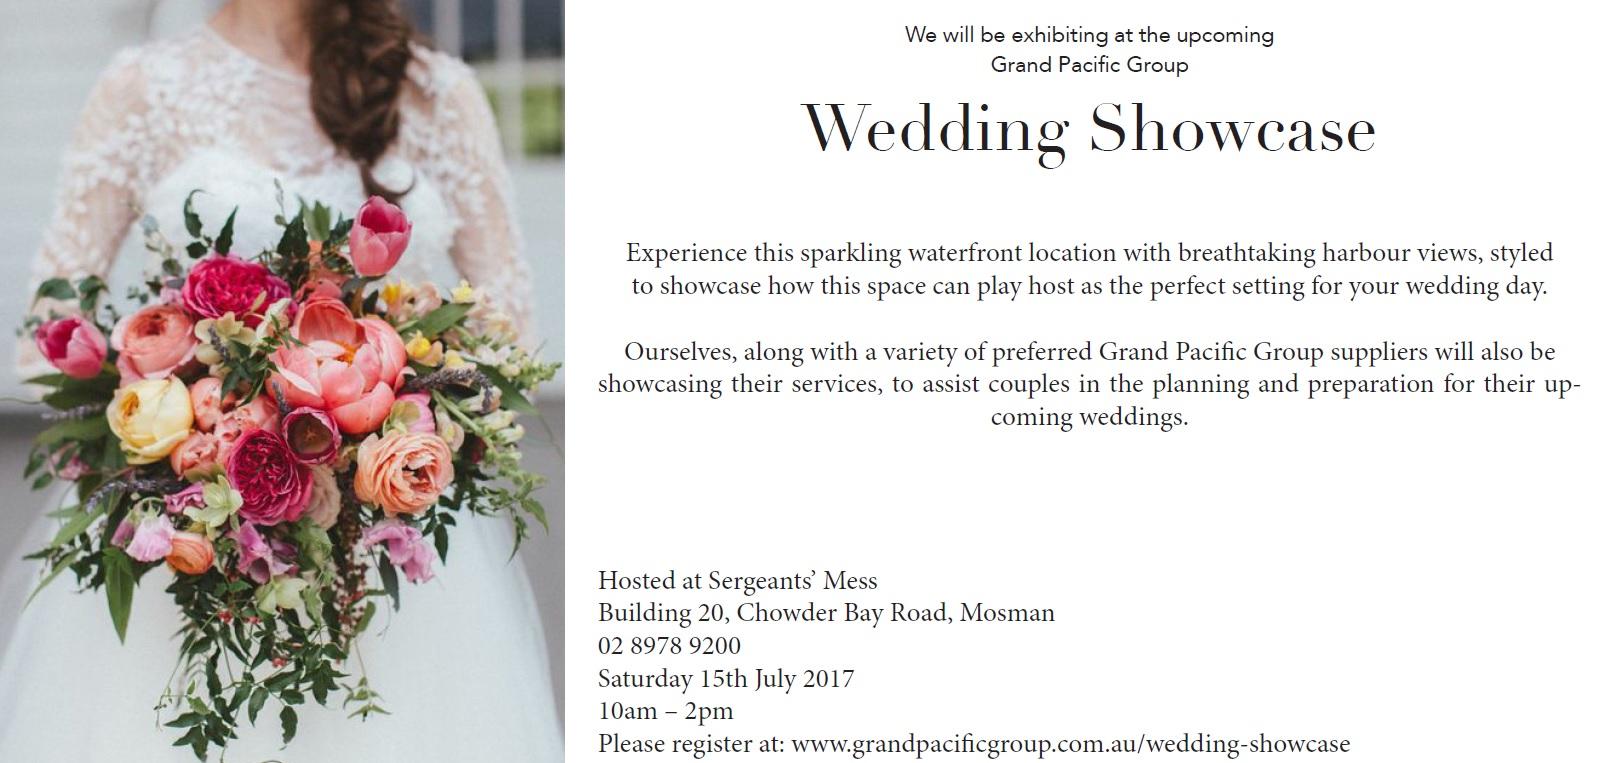 SERGEANT'S MESS WEDDING SHOWCASE 15 JULY 2017